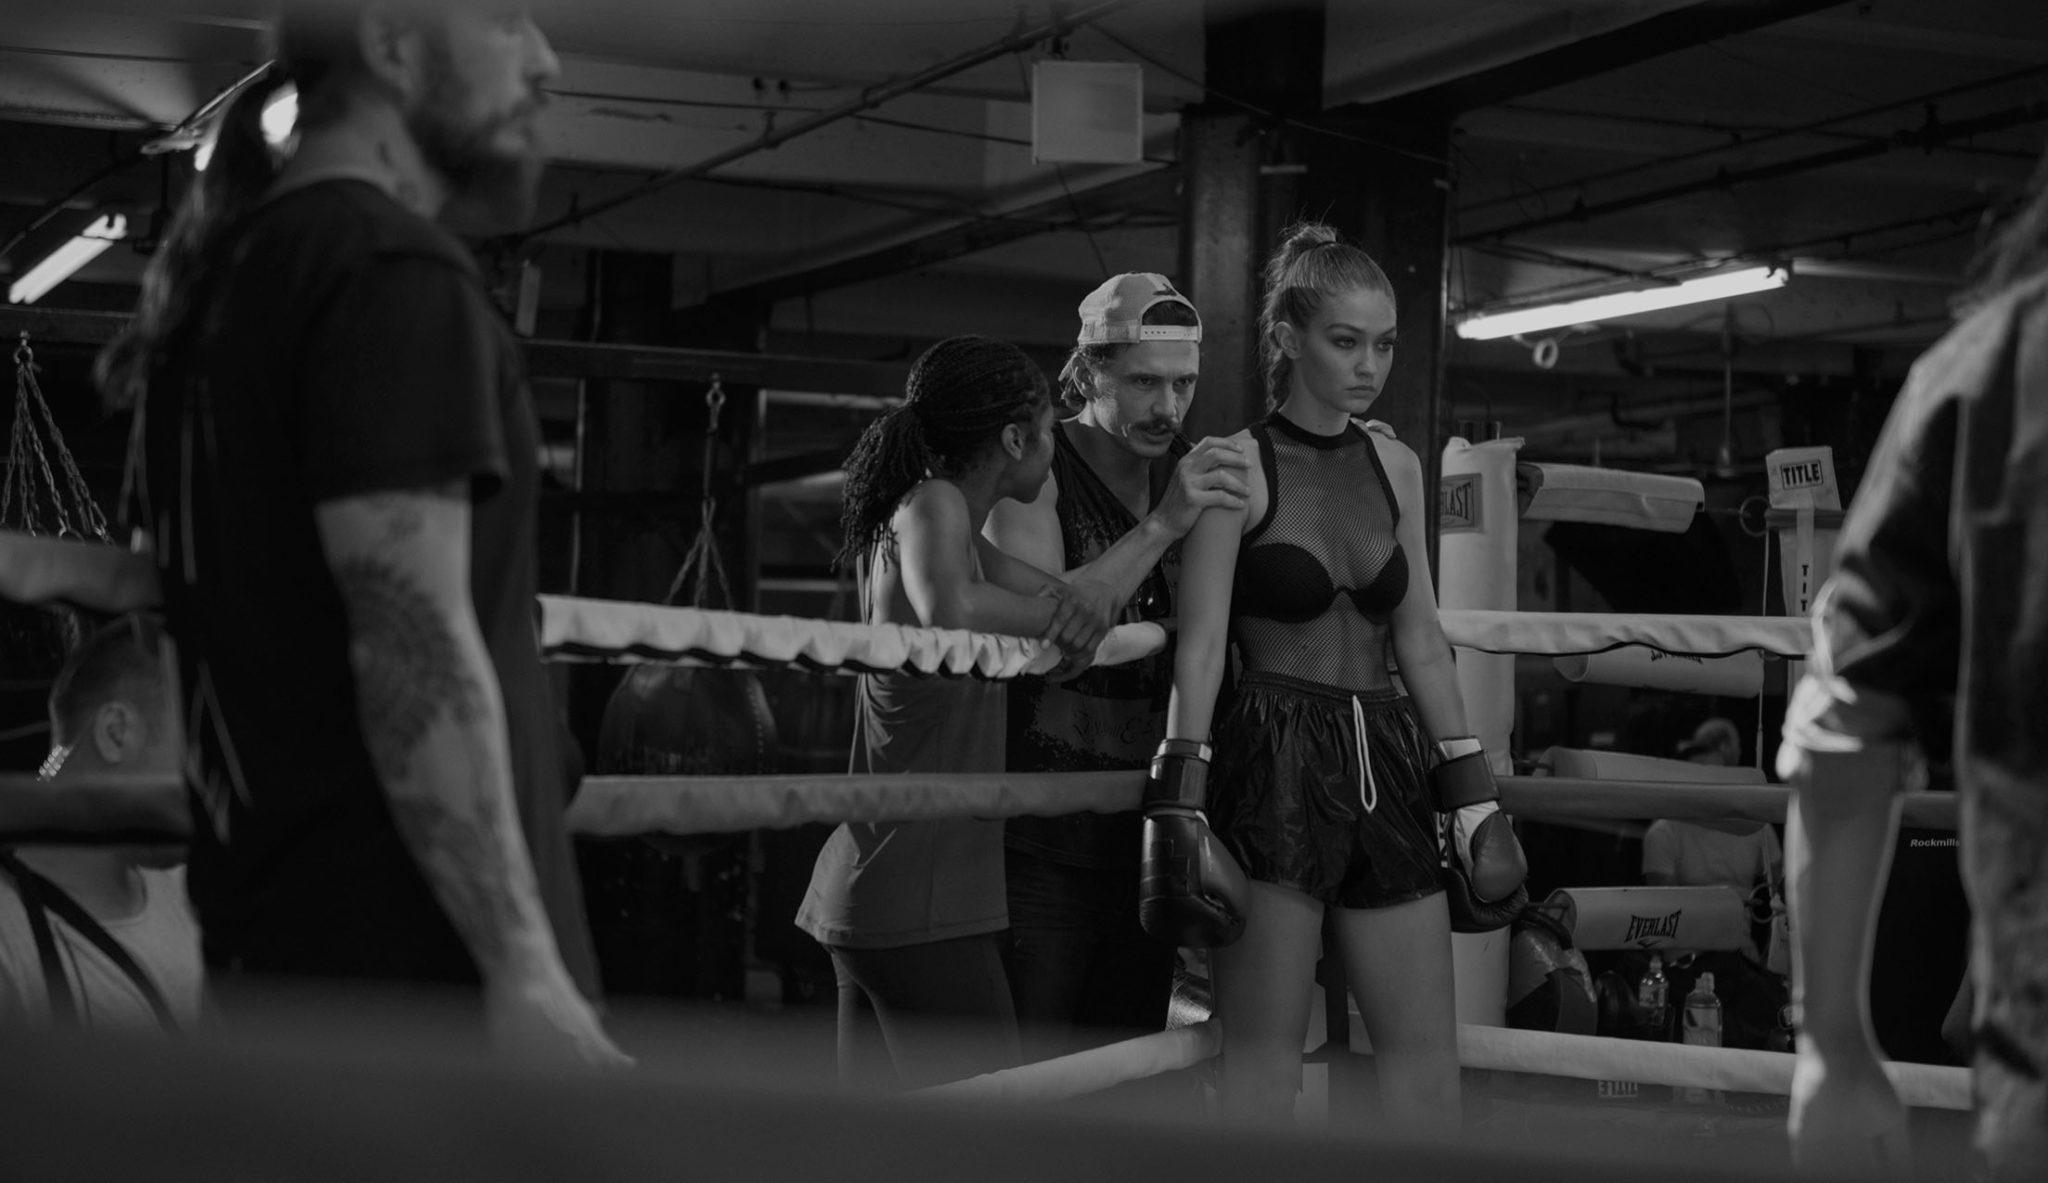 STUART WEITZMAN 'DO IT RIGHT' FILM STARRING GIGI HADID